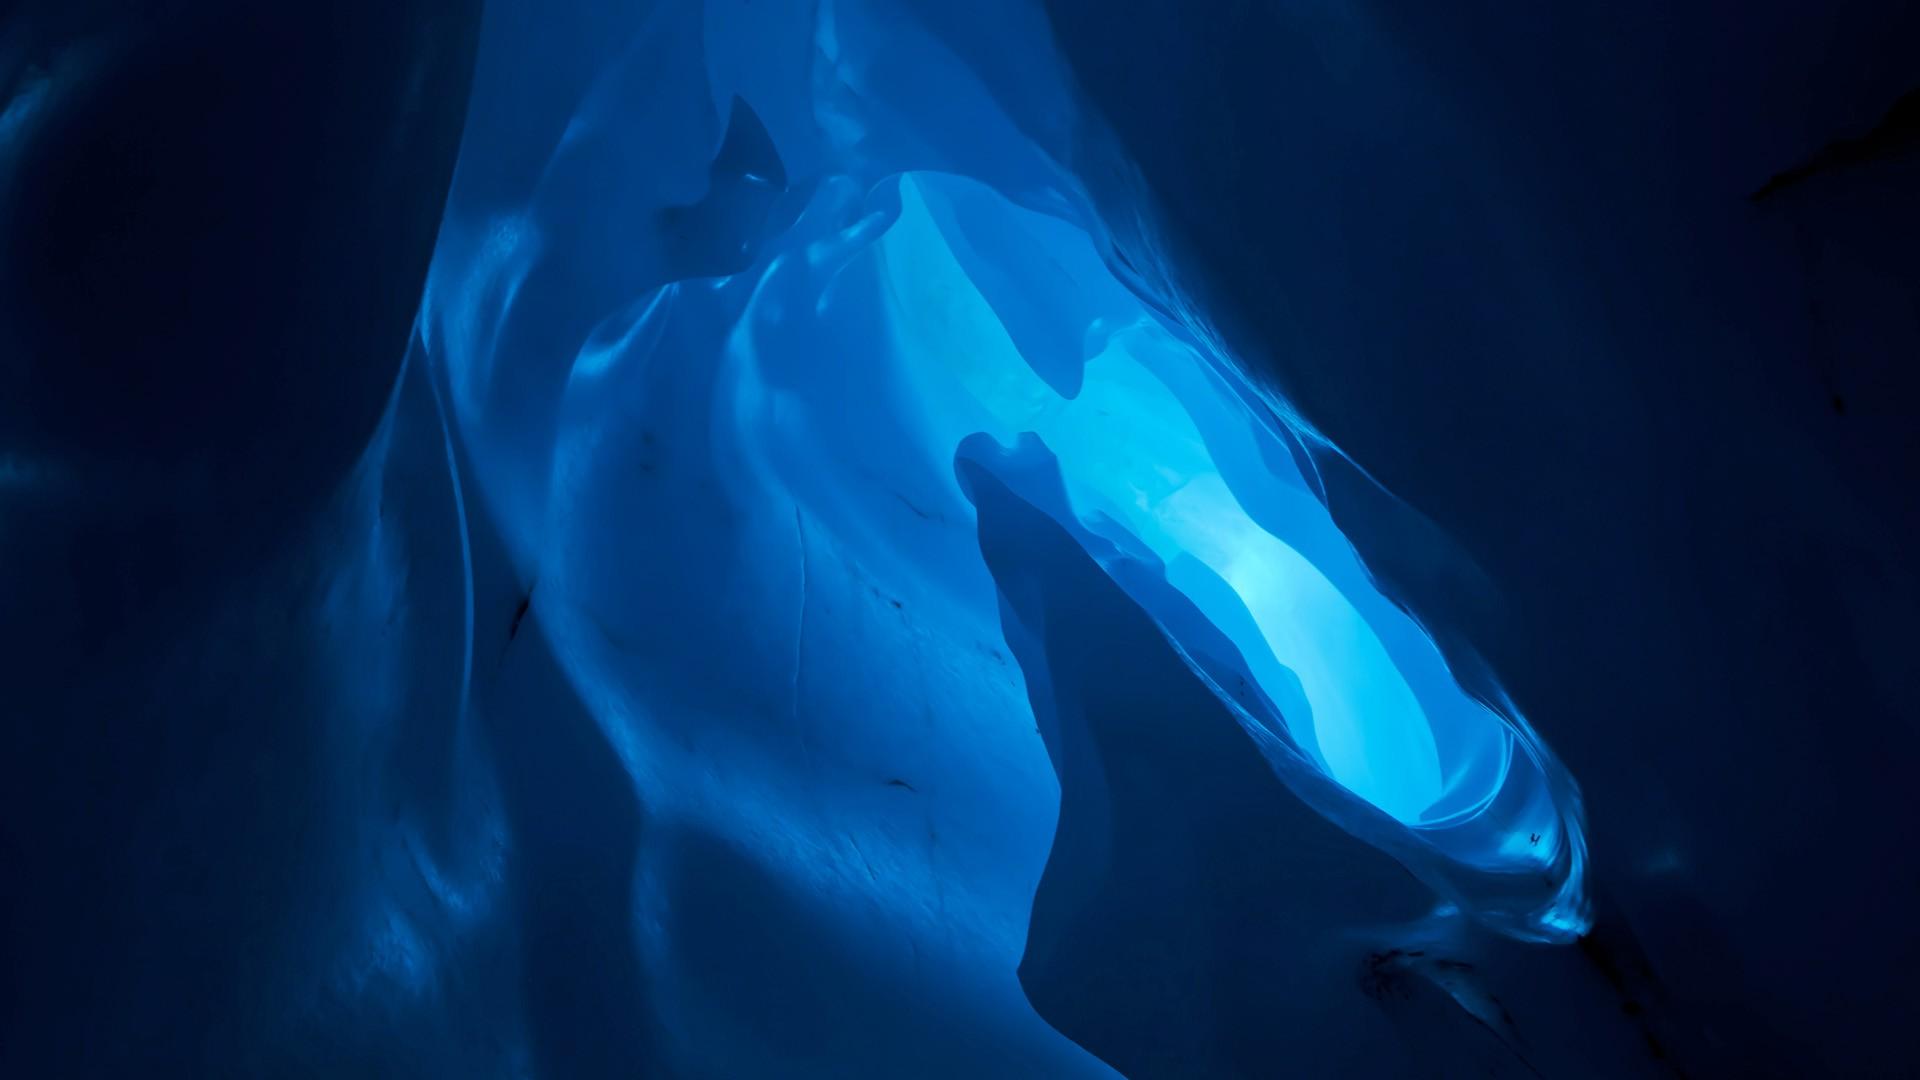 cool iceberg background